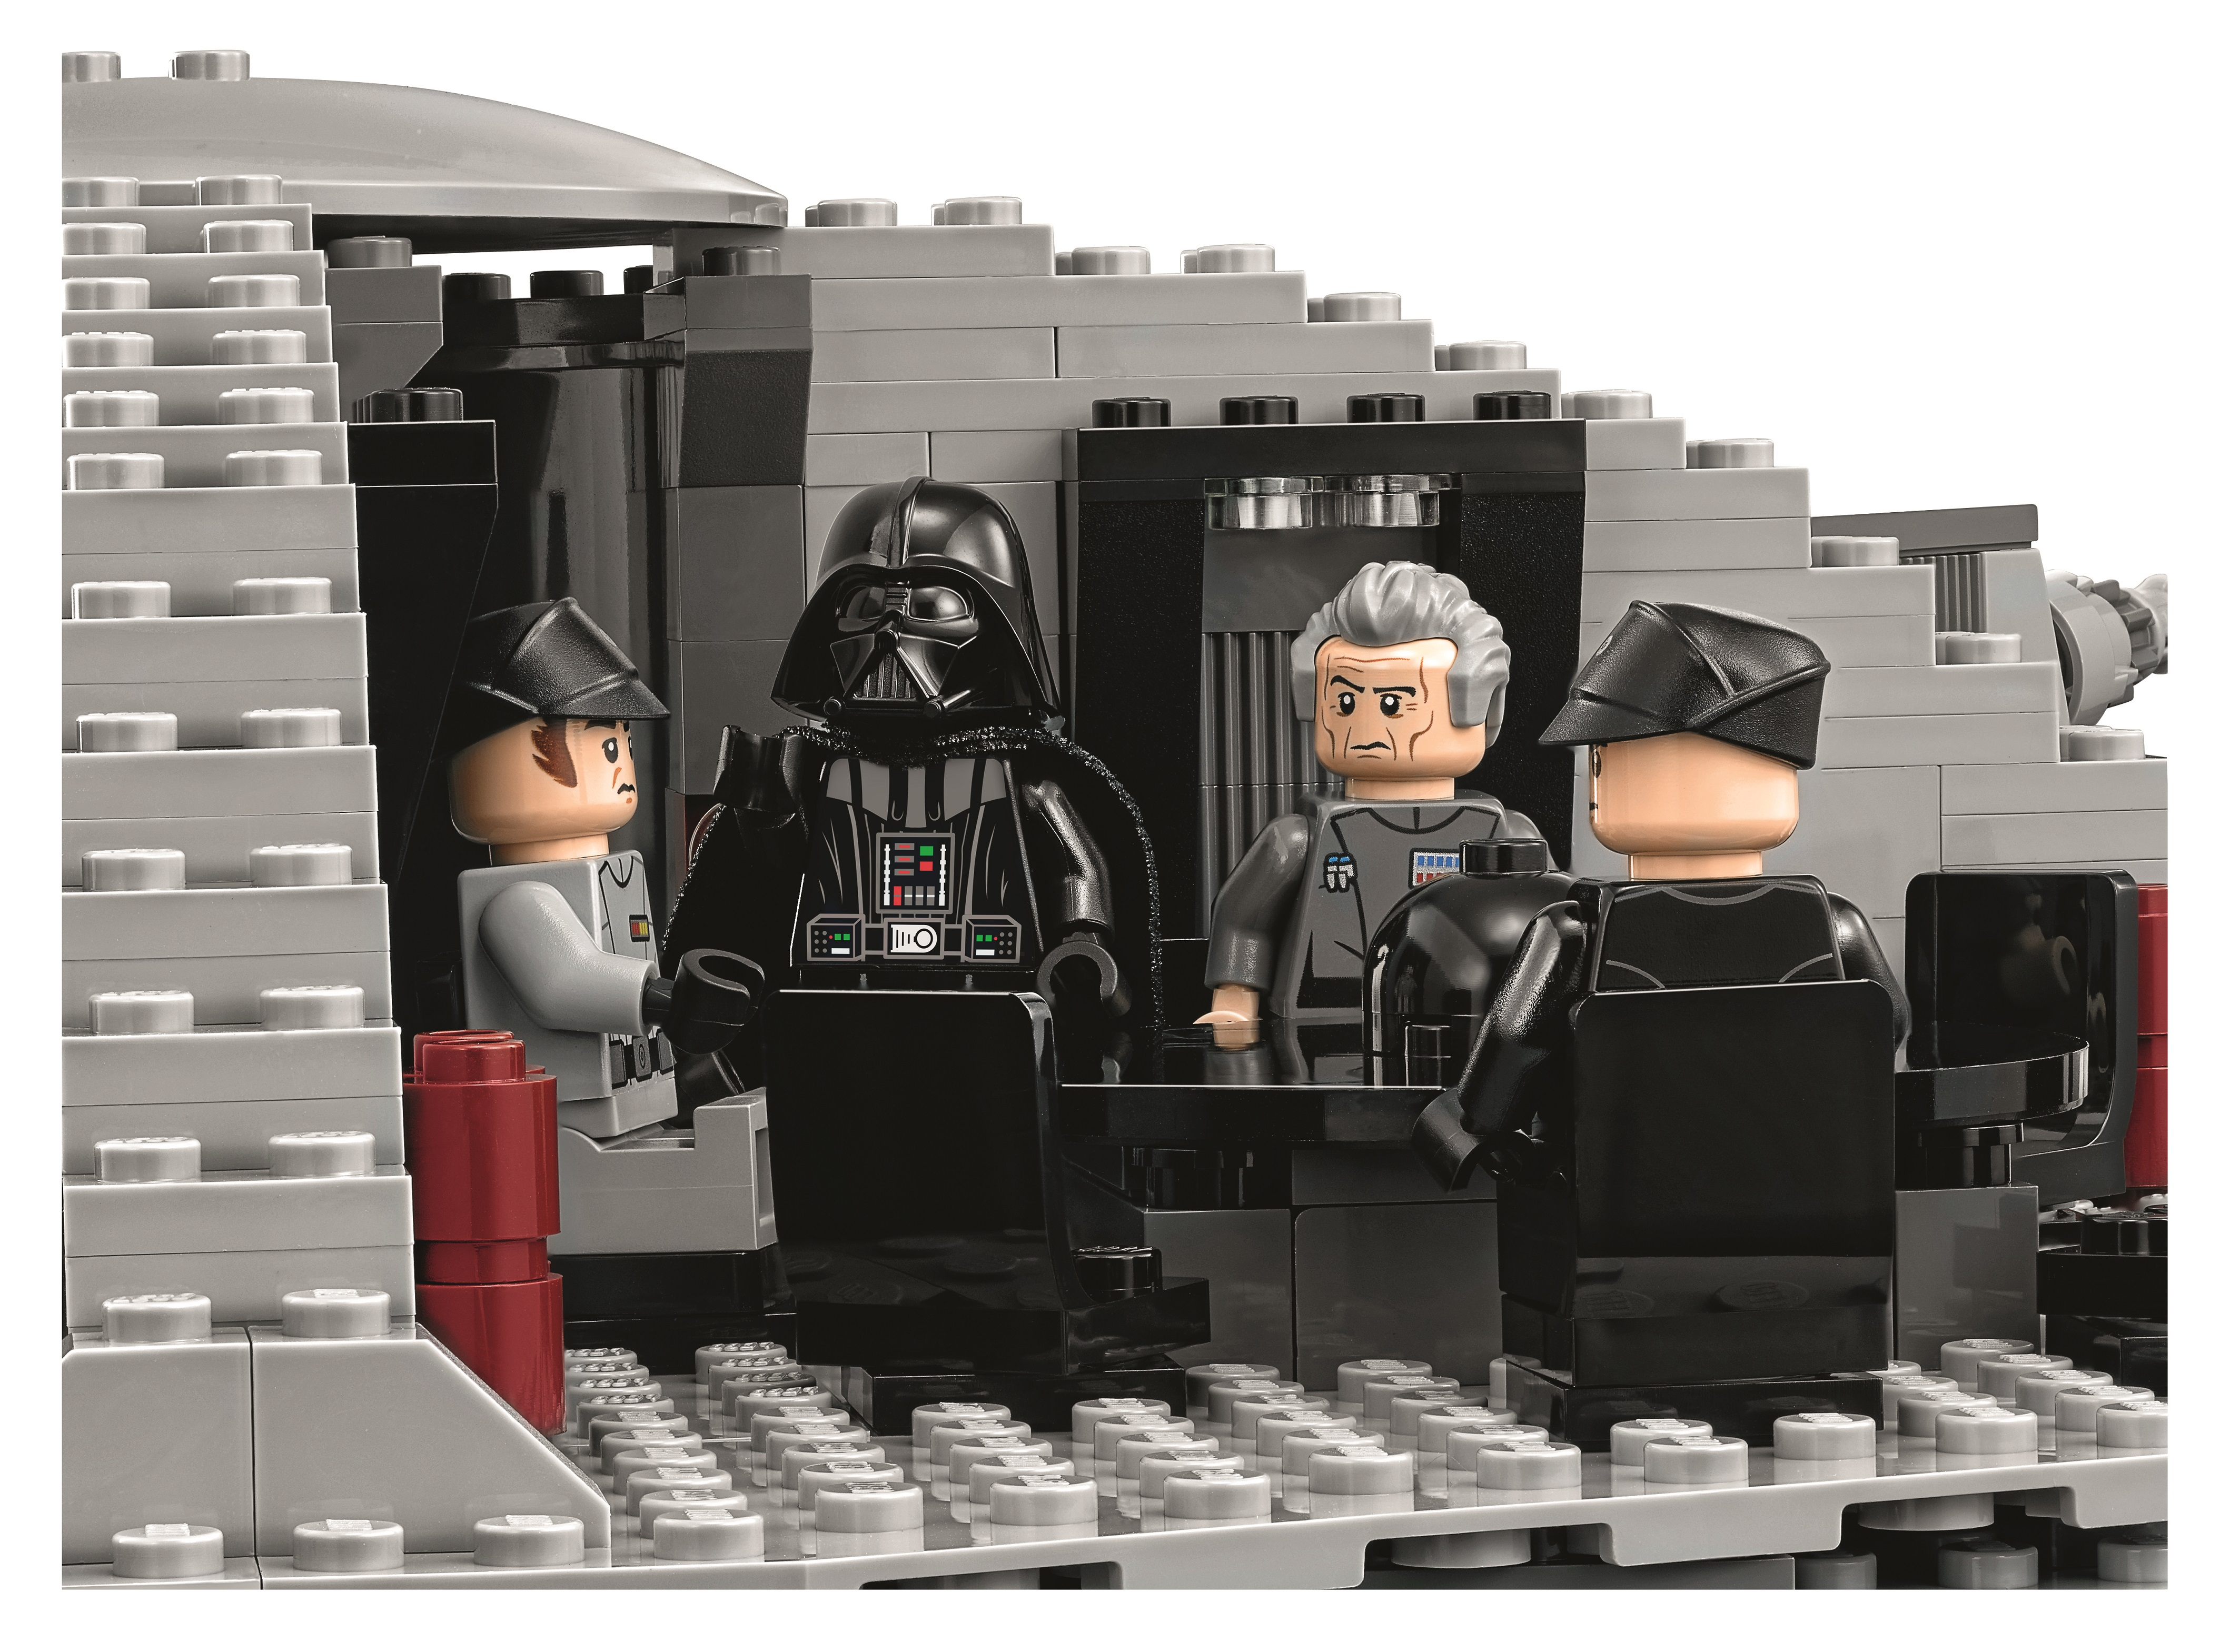 Display Case Frame for Lego Star Wars Death Star 75159 minifigures no figures